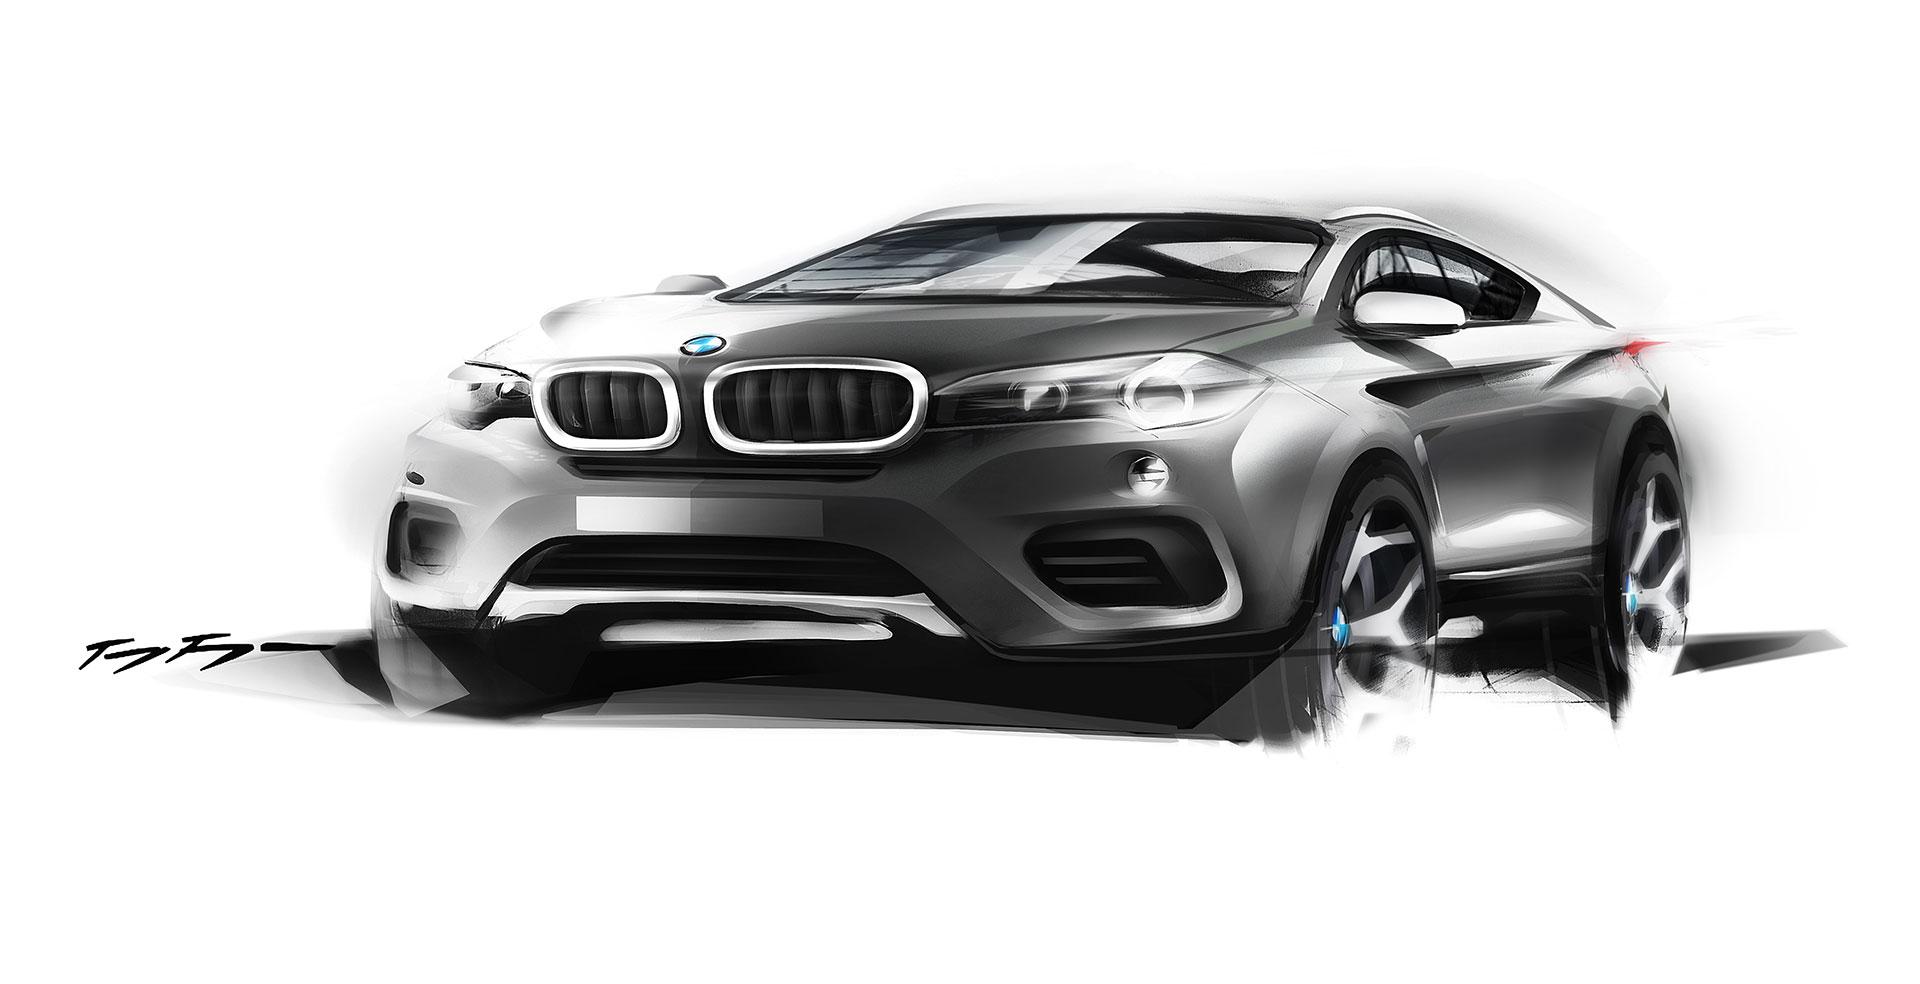 Bmw X6 Design Sketch Car Body Design